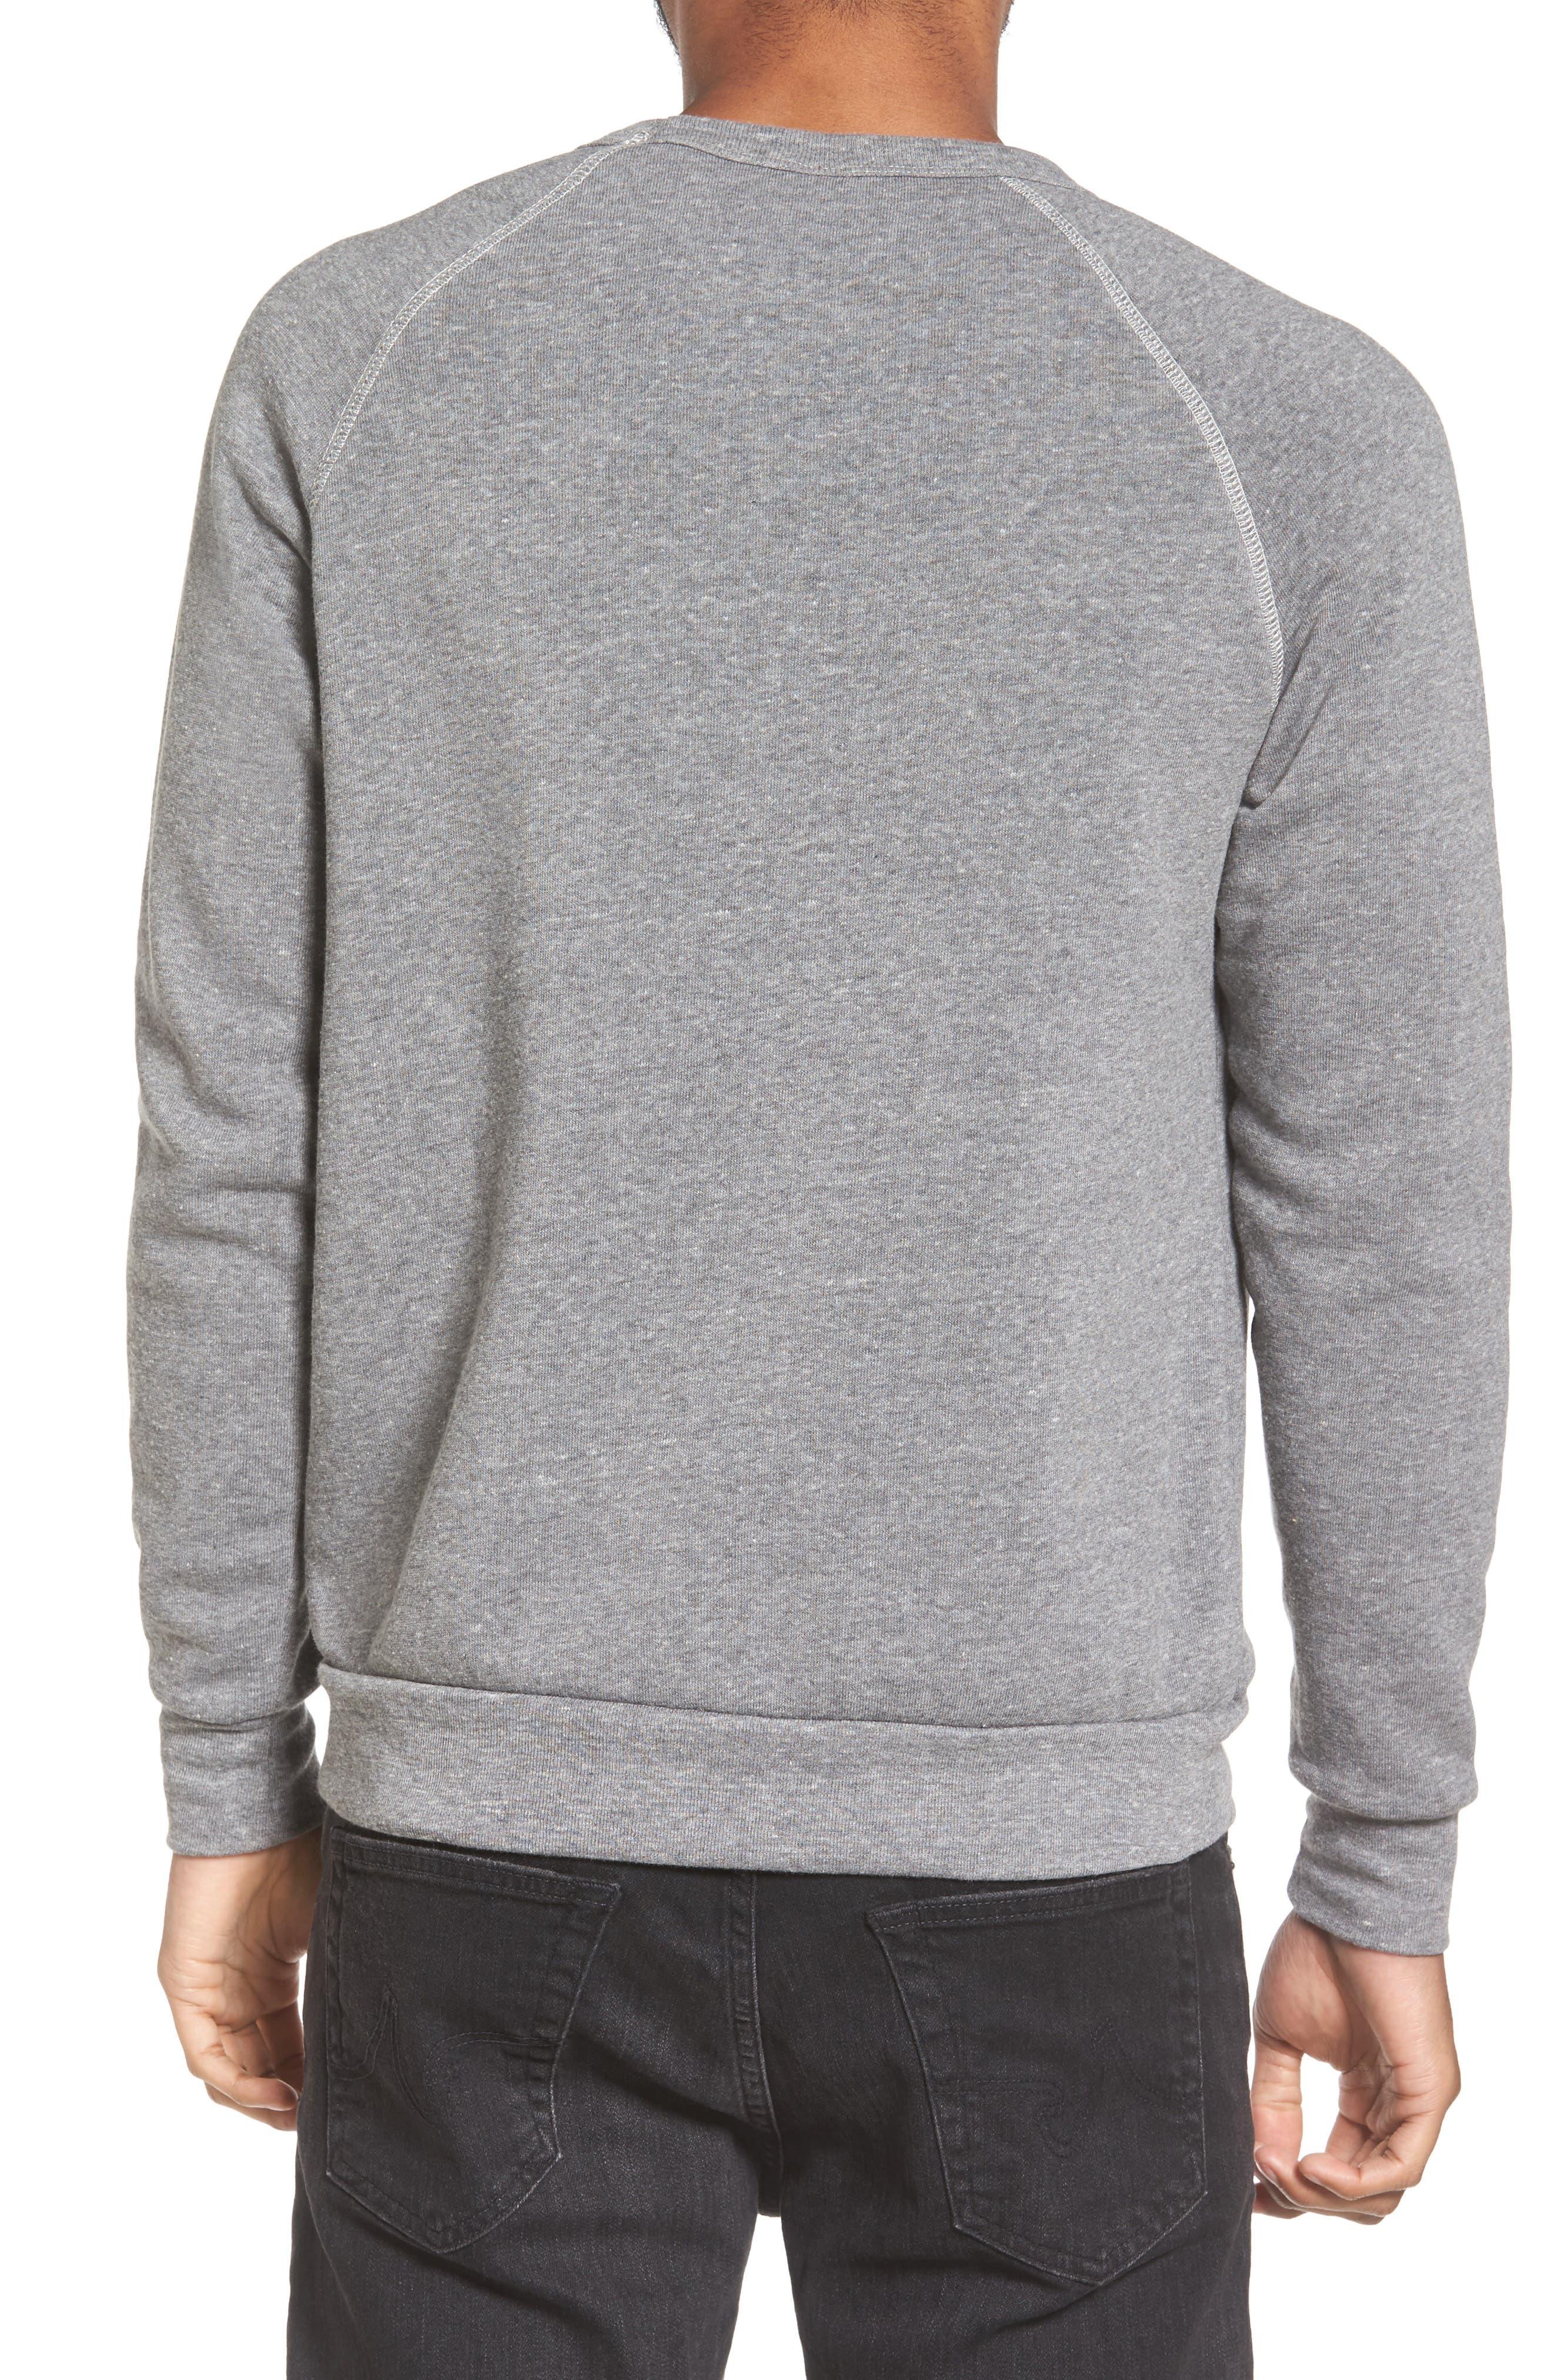 'The Champ' Sweatshirt,                             Alternate thumbnail 31, color,